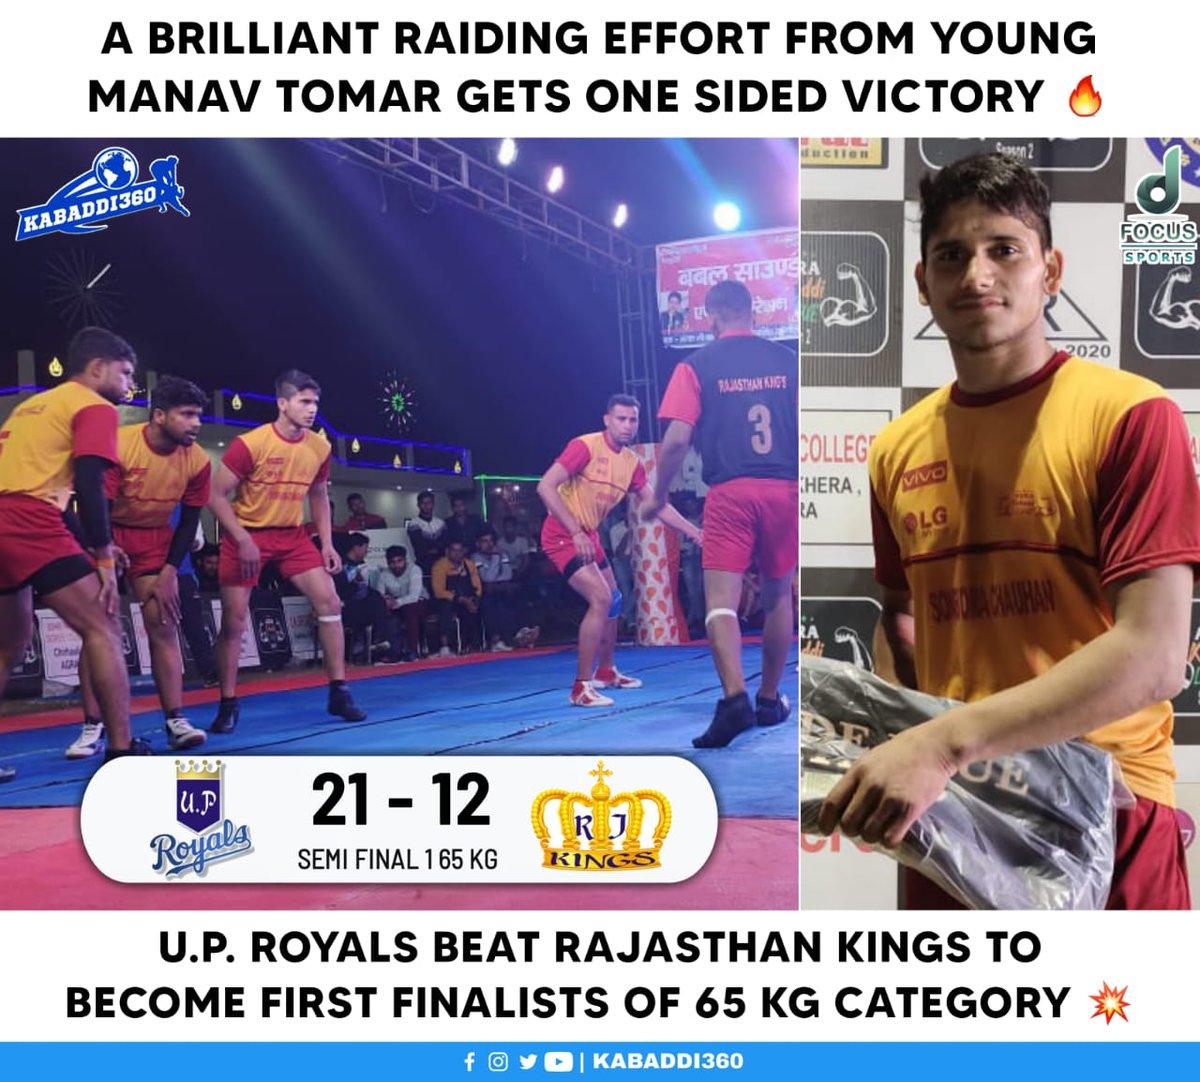 U.P. Royals have been sensational to watch in 65 kg category 😍 Watch them live on Kabaddi360 YouTube 📲    #AgraKabaddiLeague #KabaddiResults #Kabaddi360